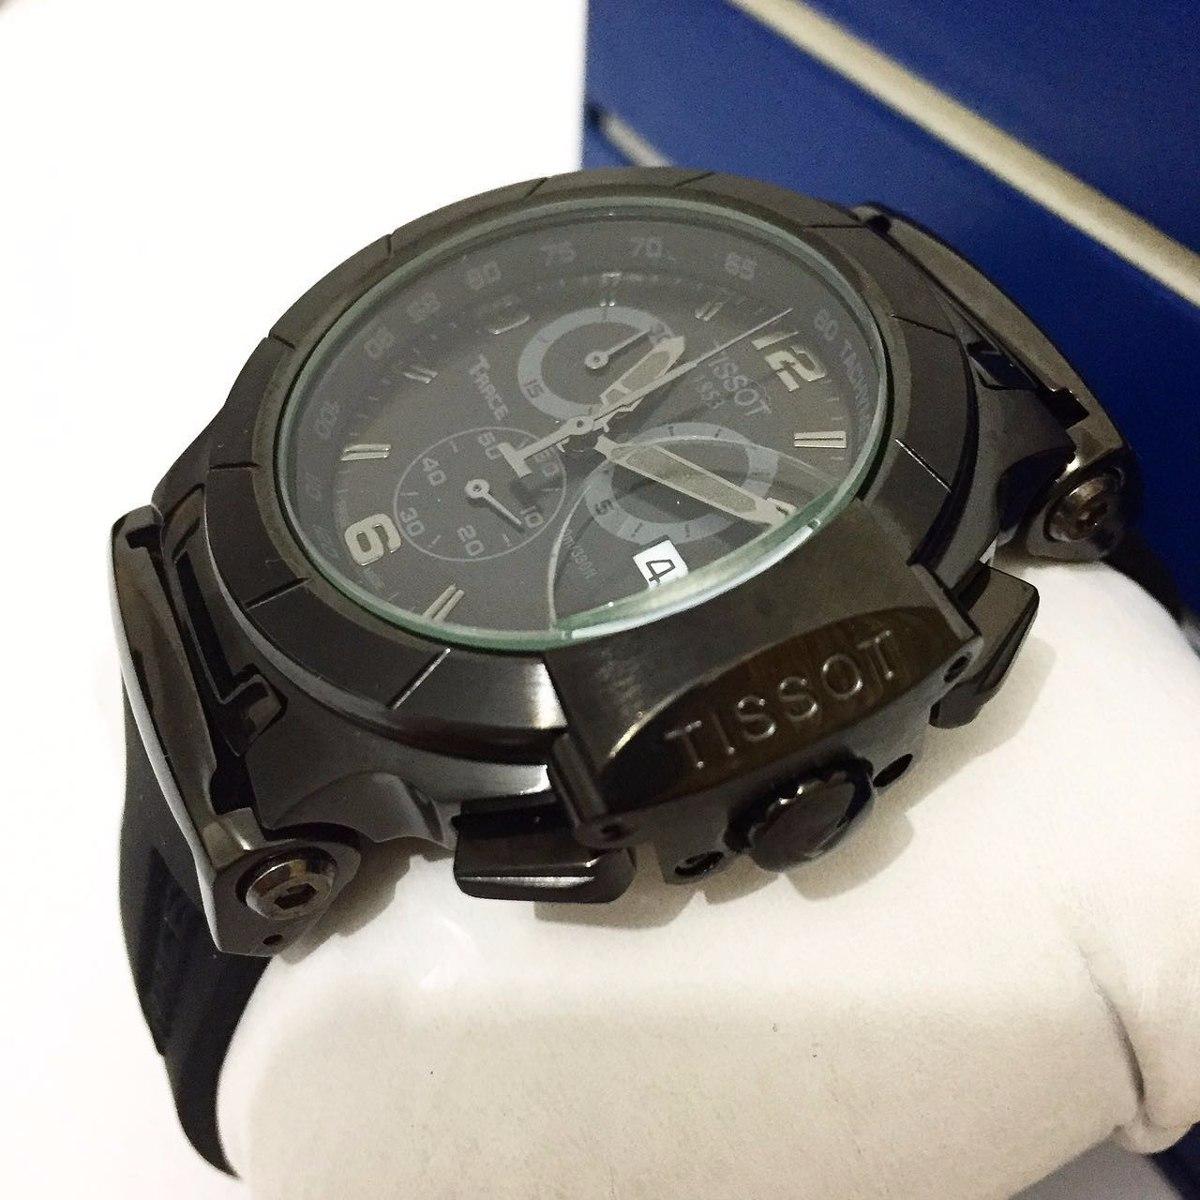 d479c2421e4 Relógio Tissot 1853 T-race Preto - R  500